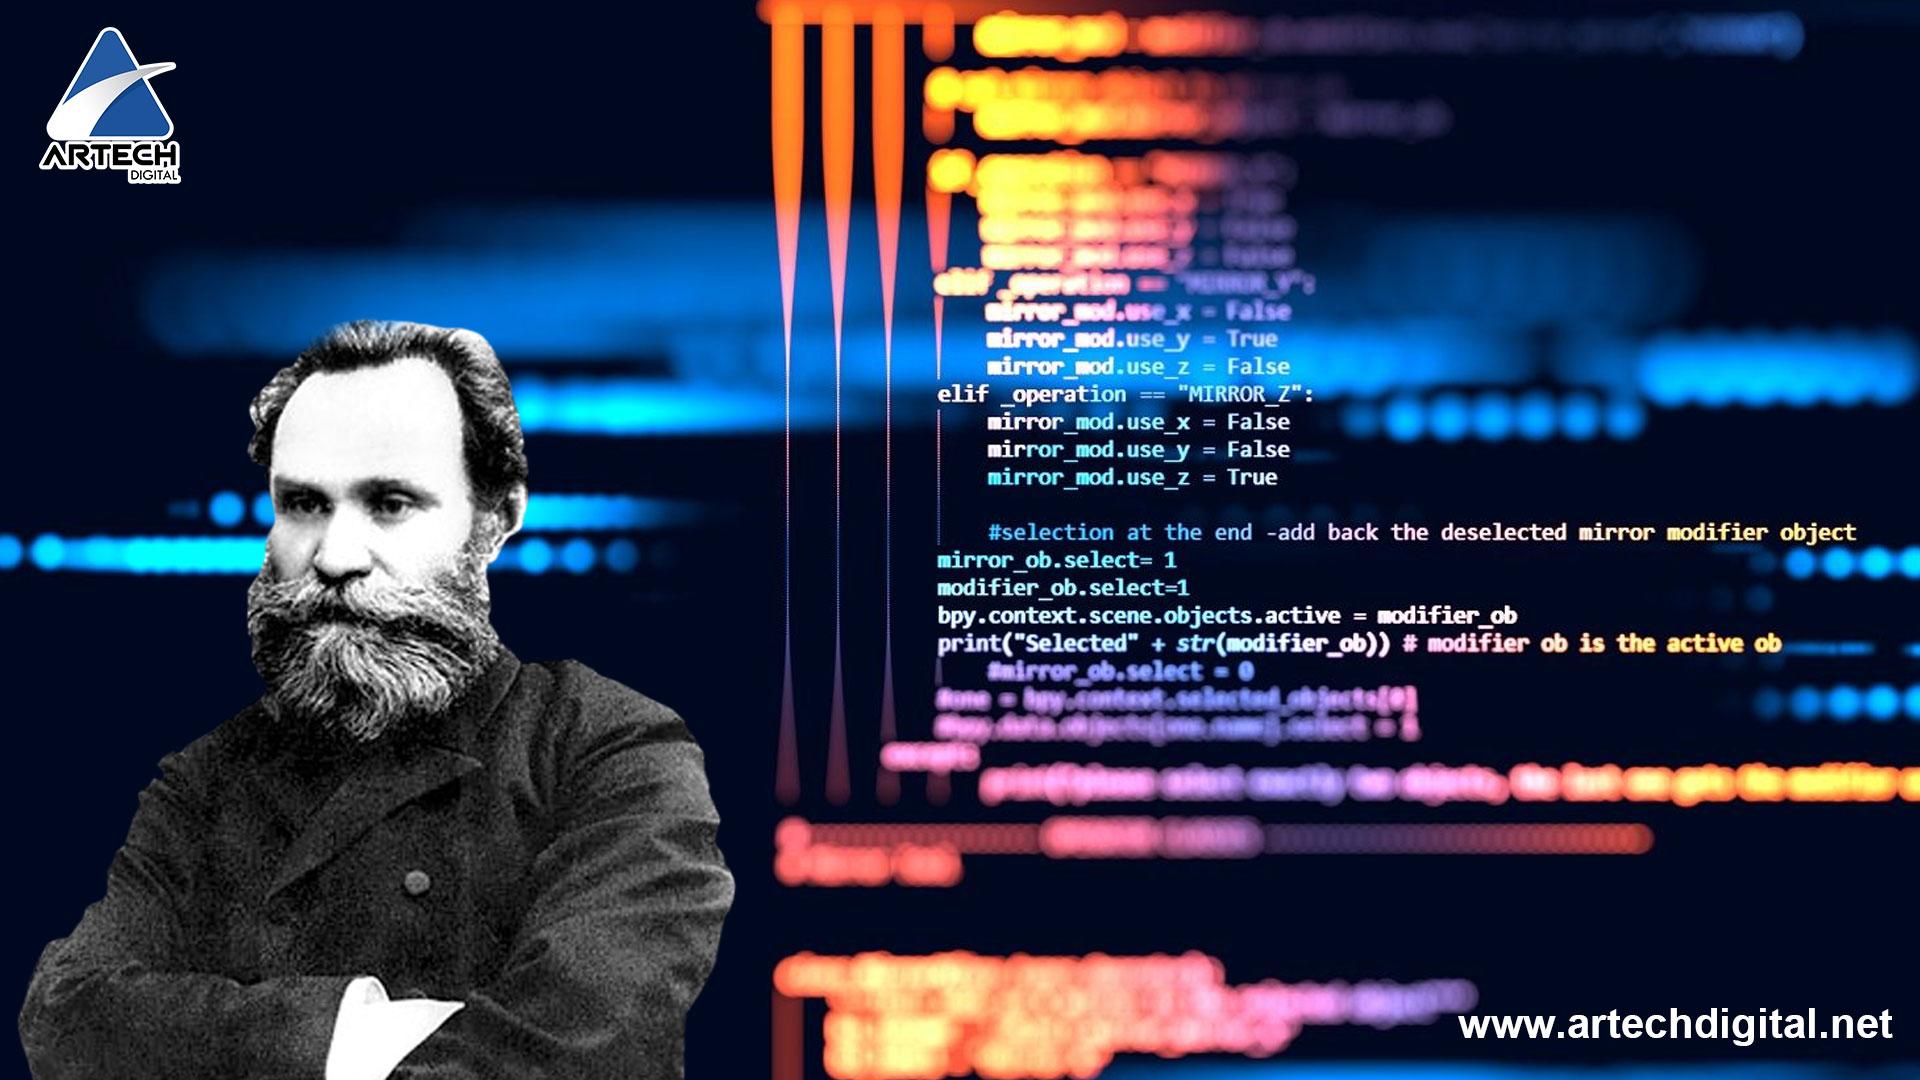 Discover how the Ivan Pavlov-inspired algorithm works